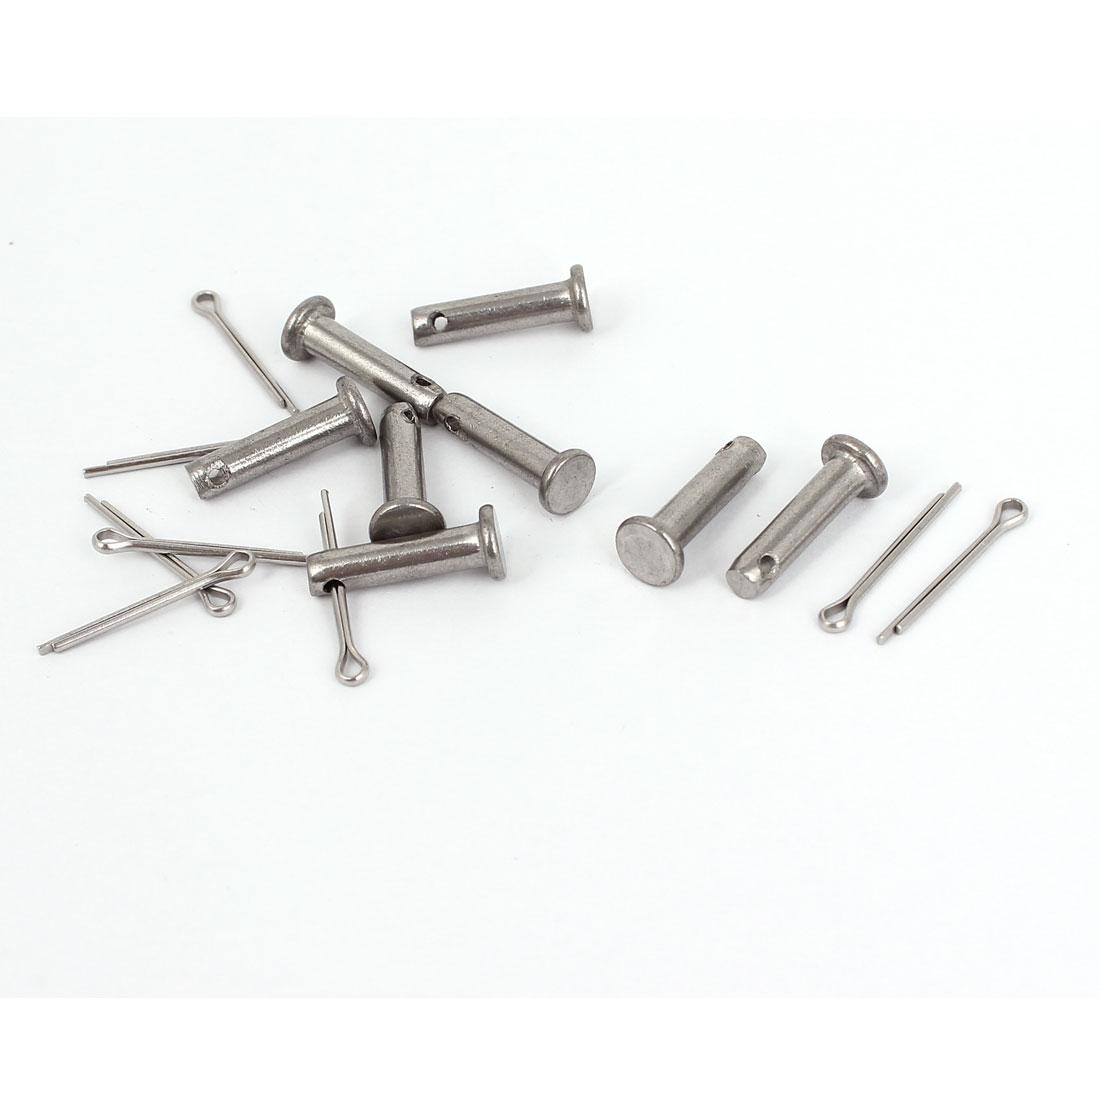 M4 x 16mm Flat Head 304 Stainless Steel Round Clevis Pins Fastener 8 Sets